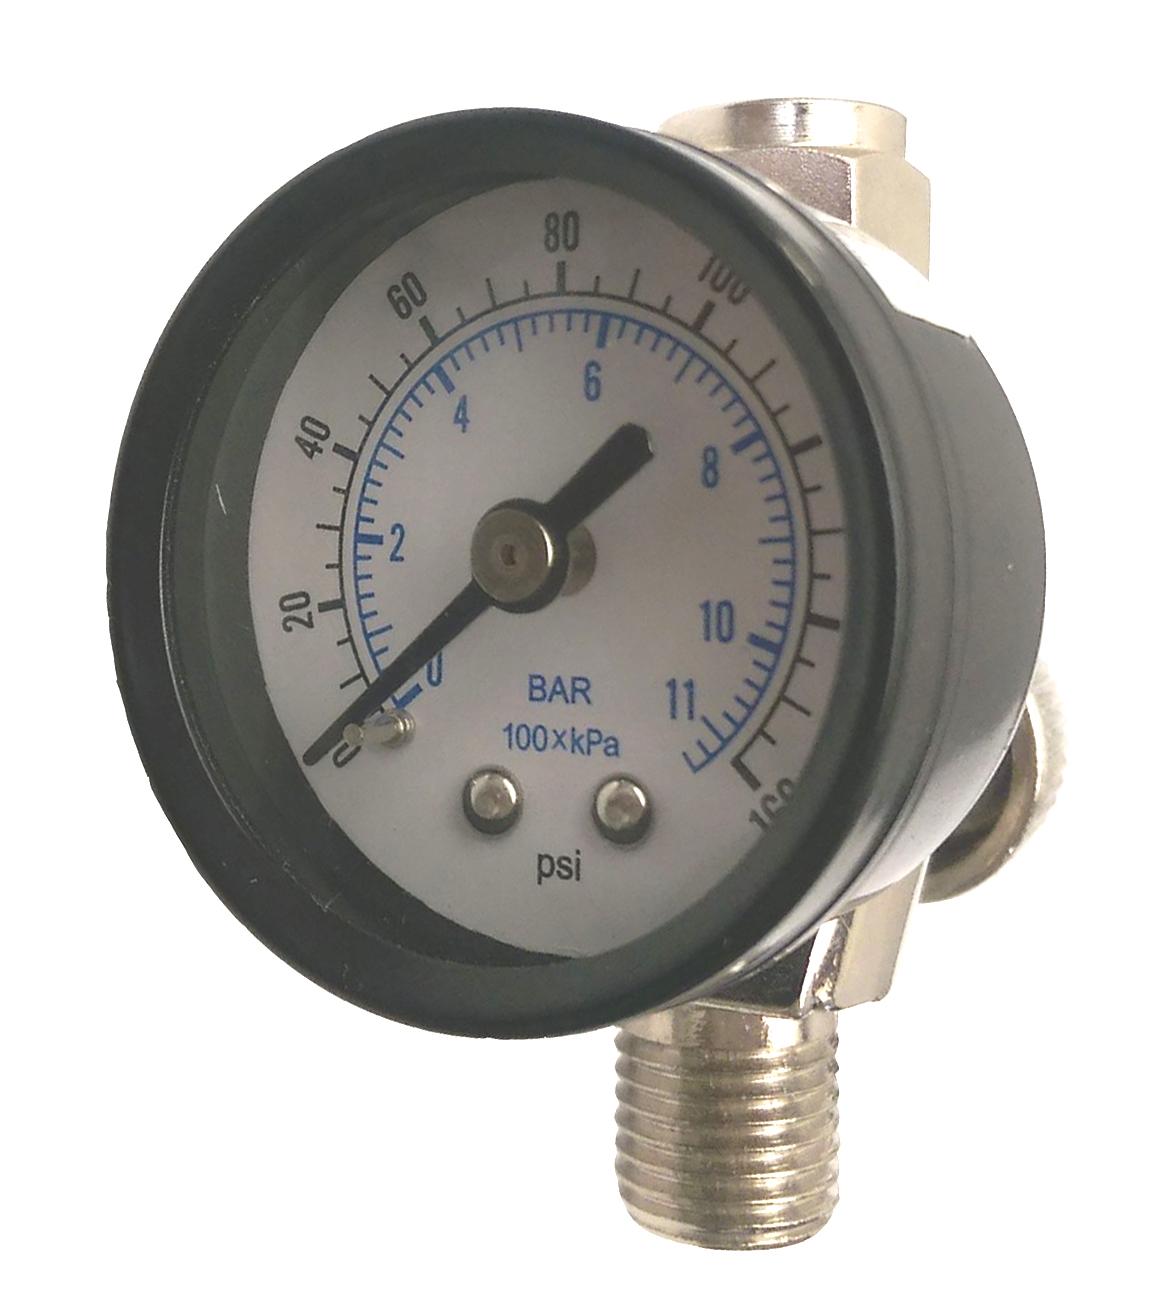 Luchtdrukmanometer